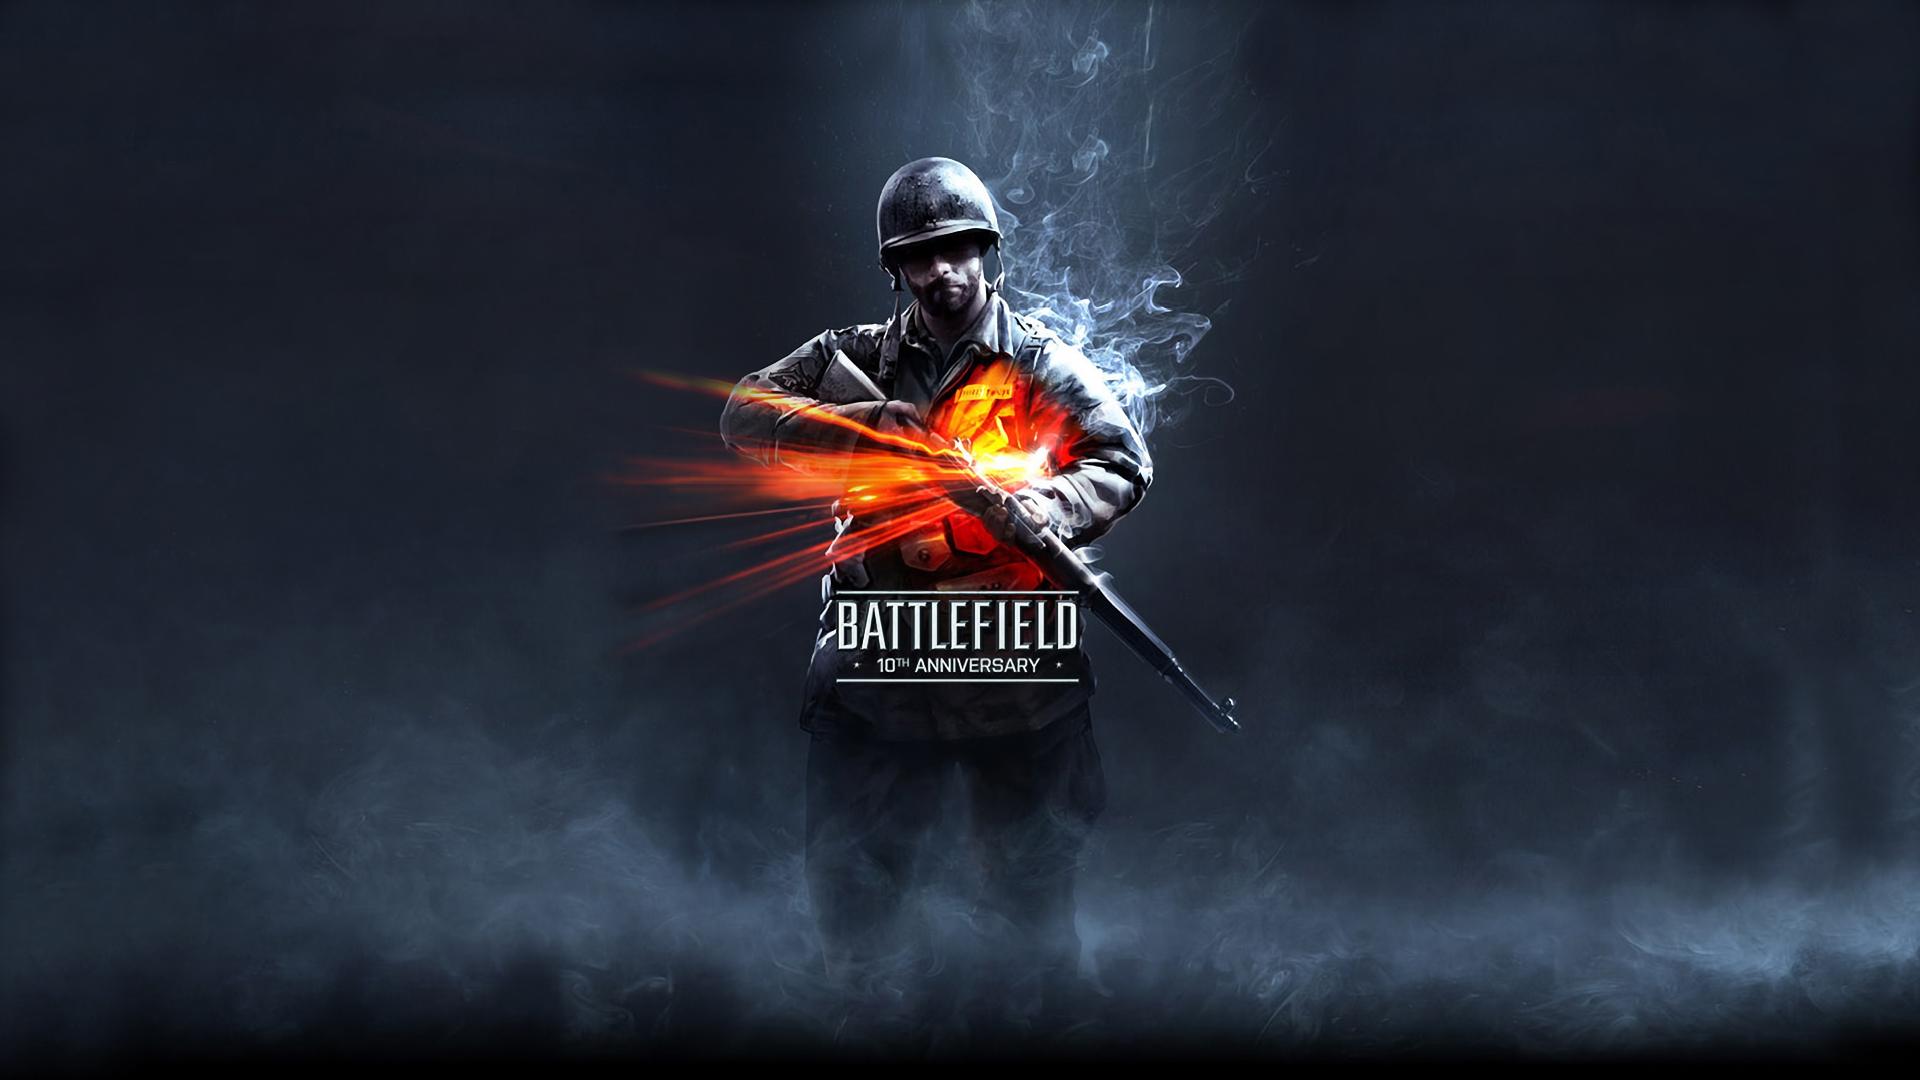 Battlefield 10th Anniversary Hd Wallpaper